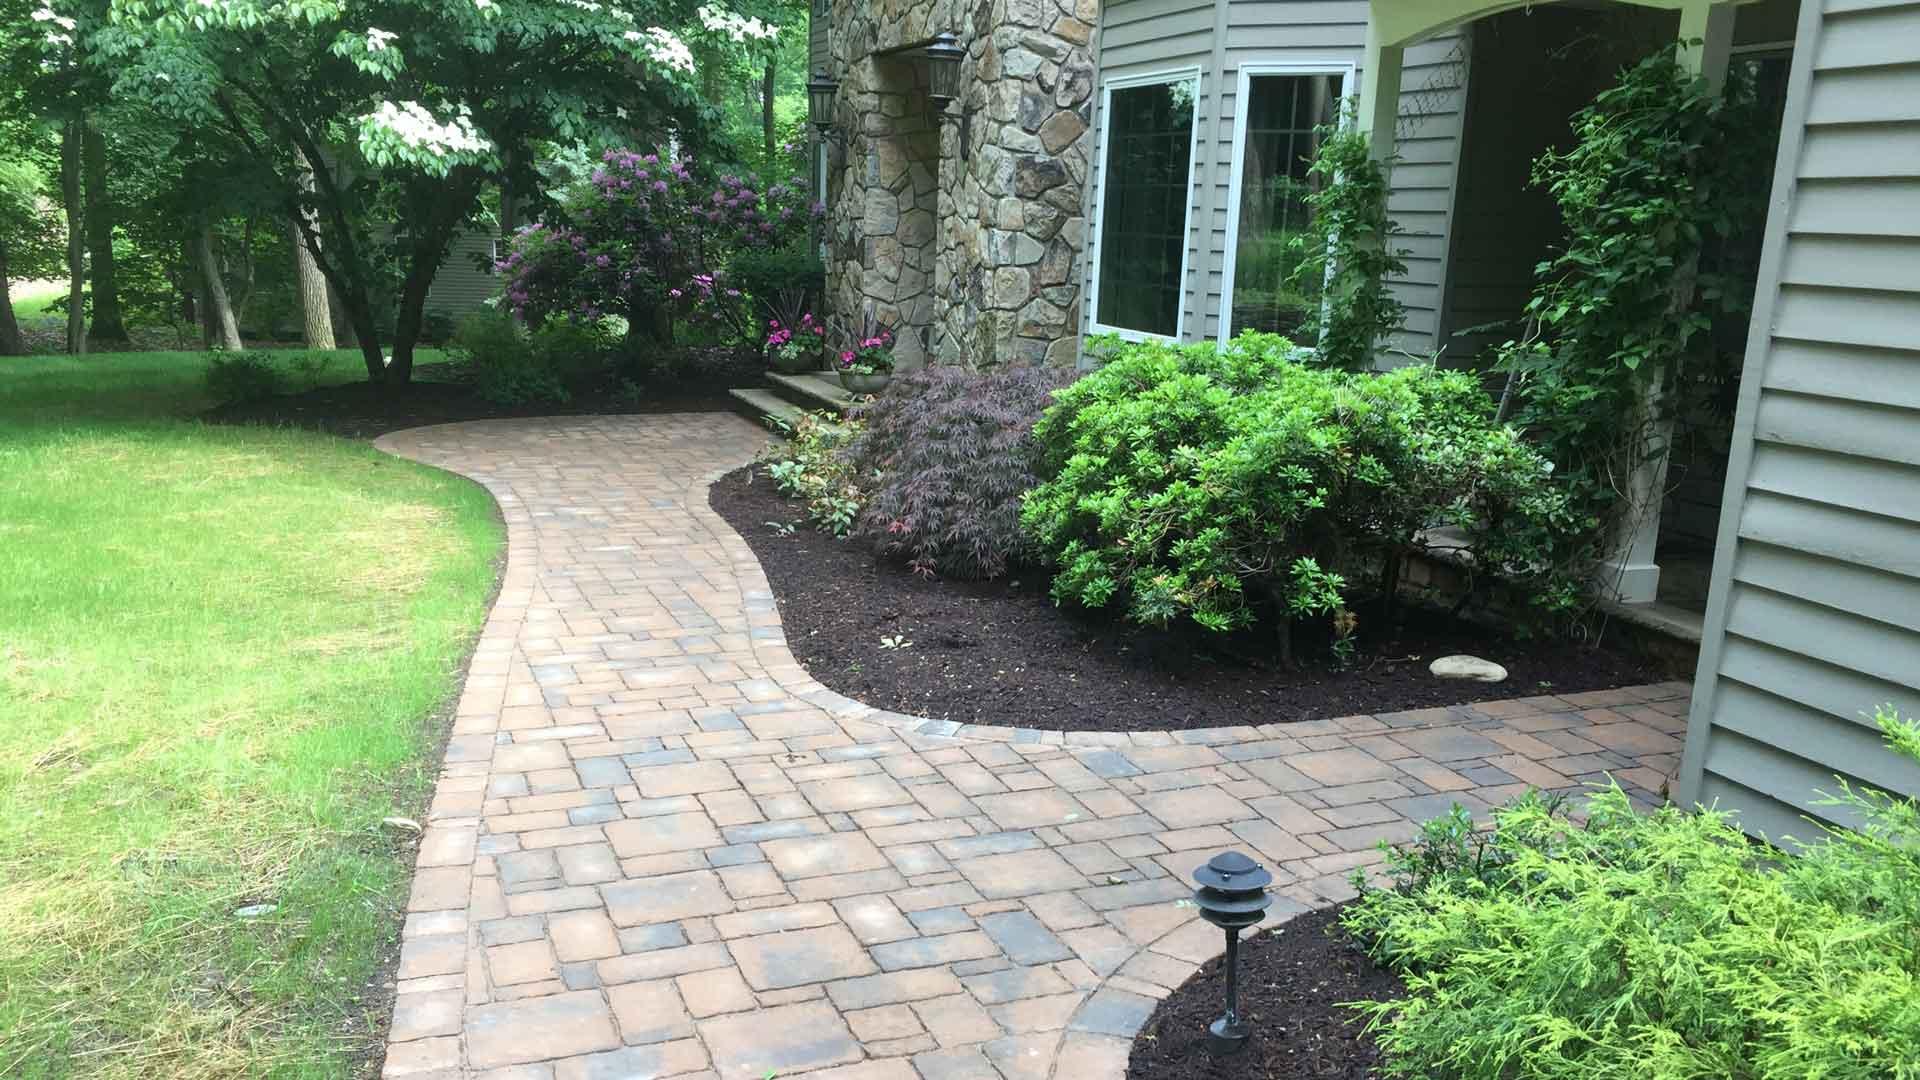 Auburn-Sky-Landscaping-Hardscape-Construction-Front-Walkway-Paver.jpg